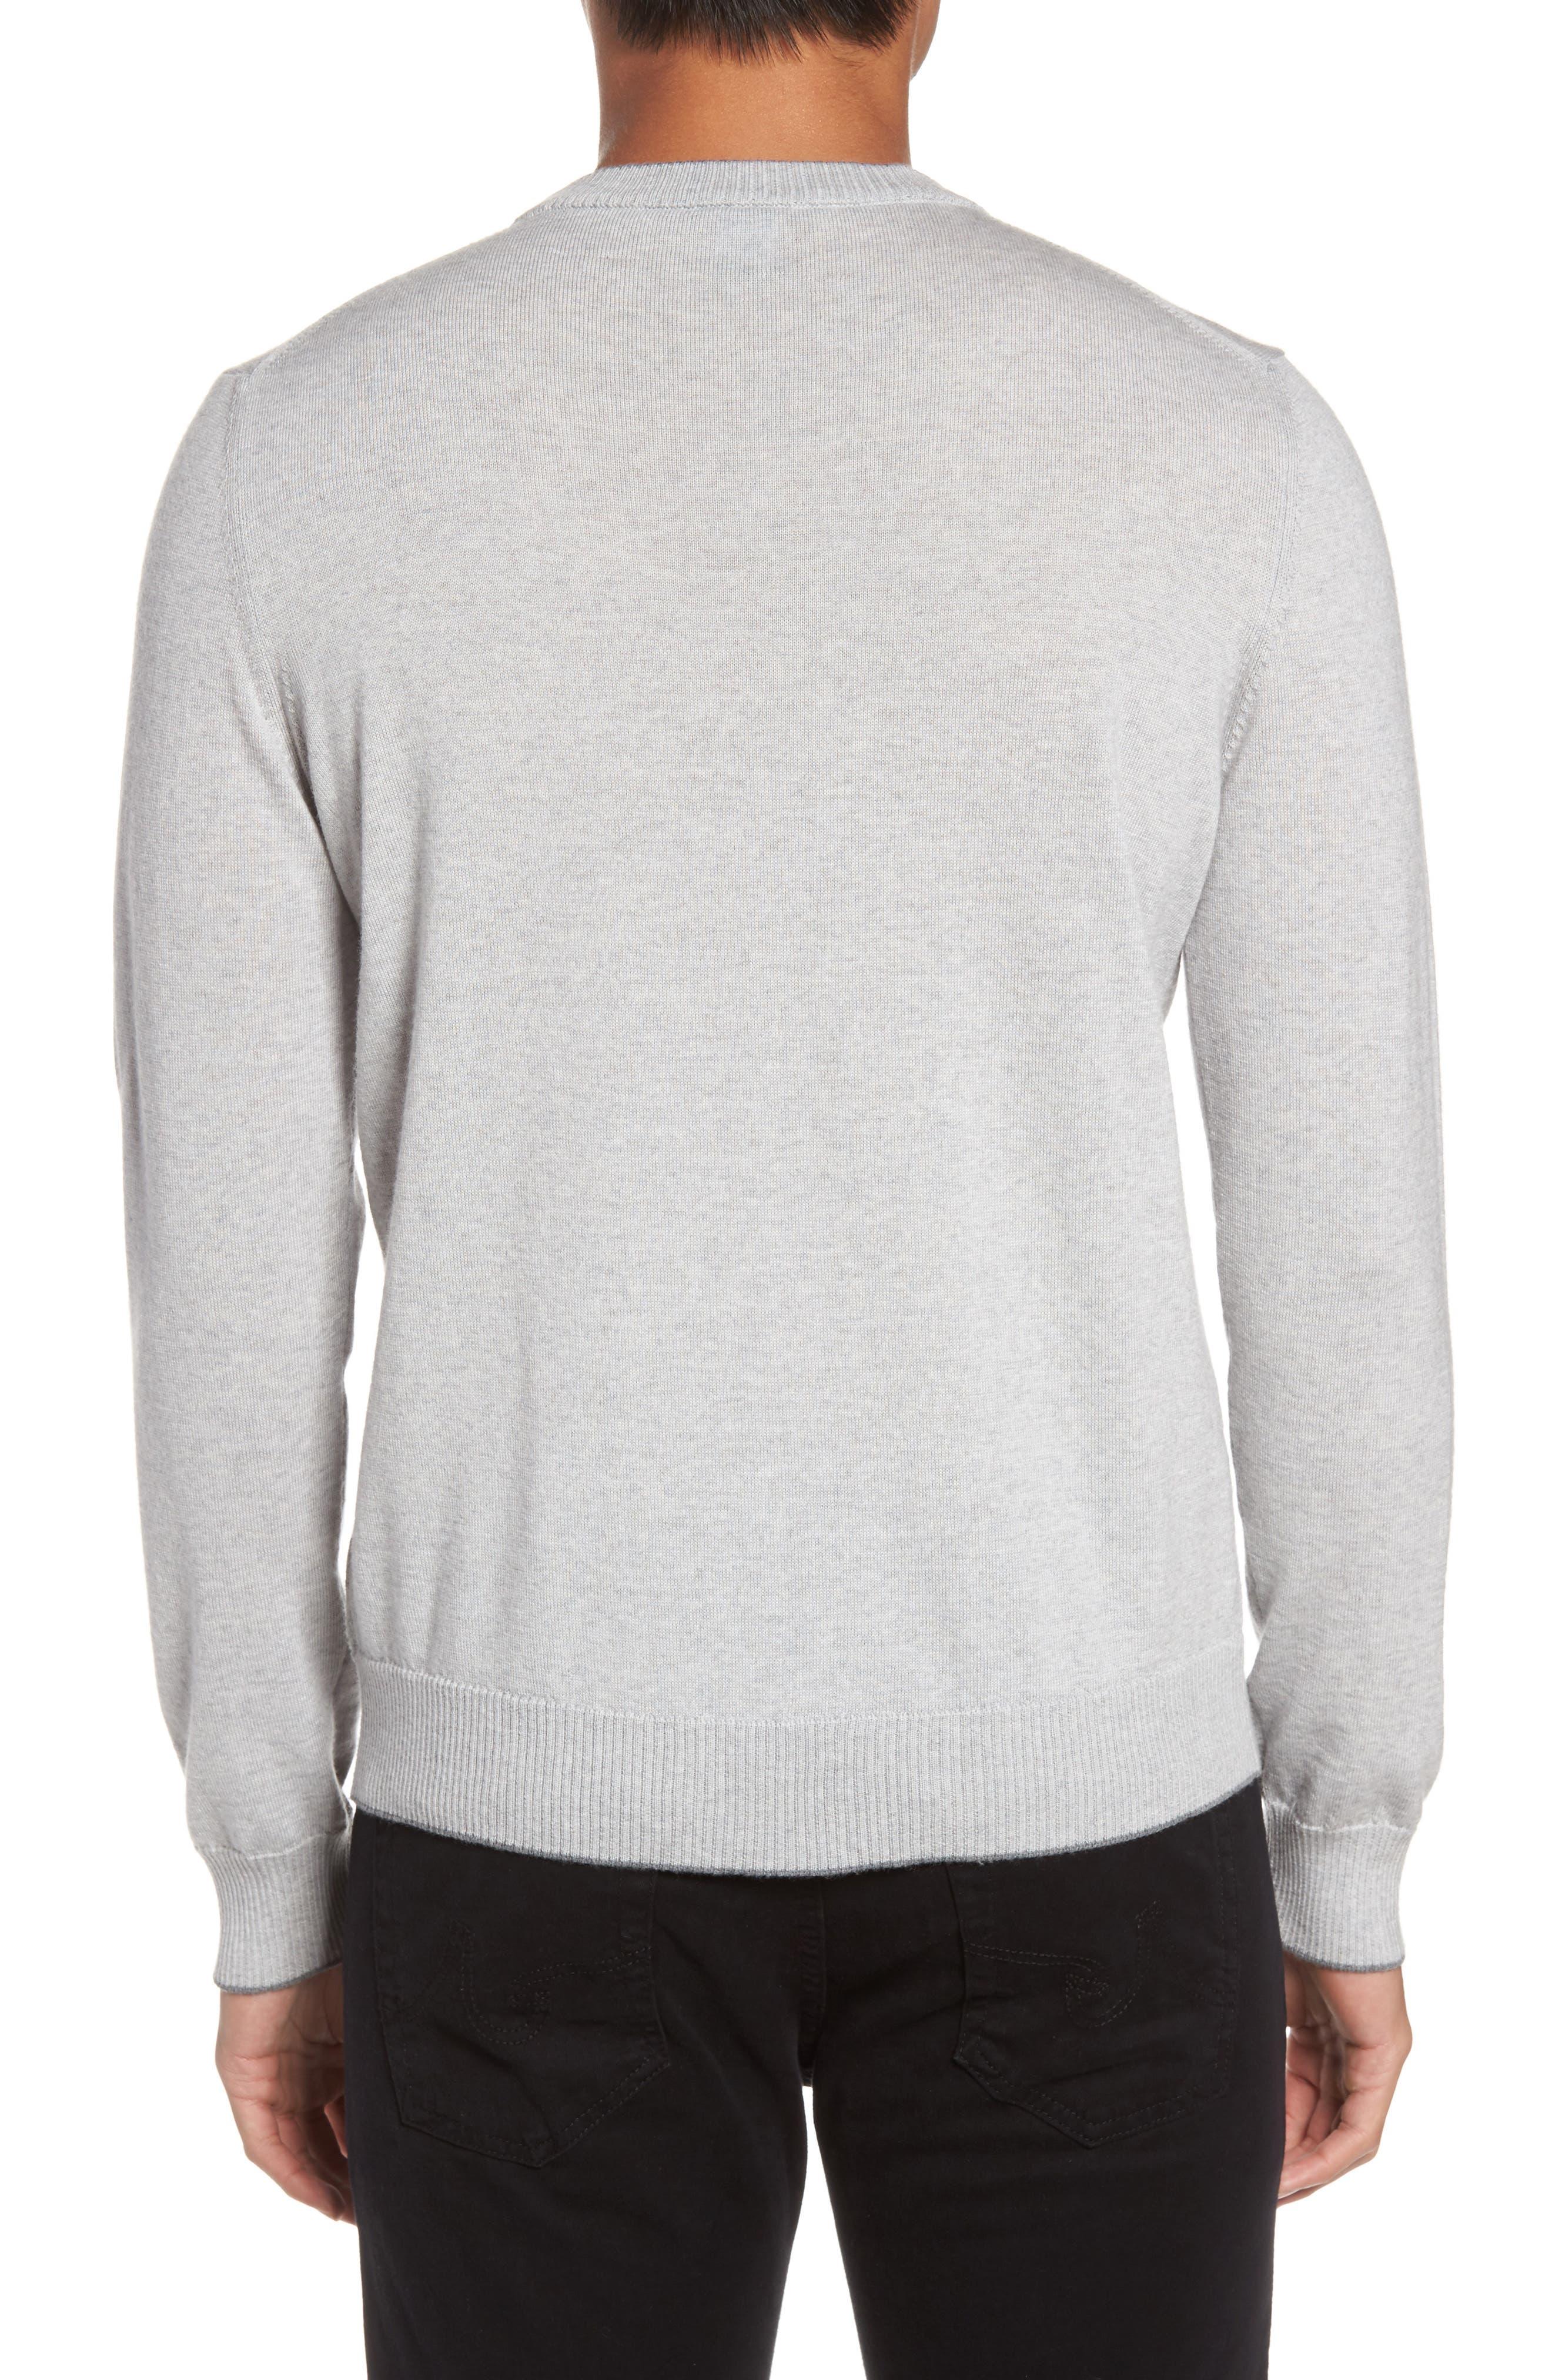 Virgin Wool Crewneck Sweater,                             Alternate thumbnail 2, color,                             Light Grey